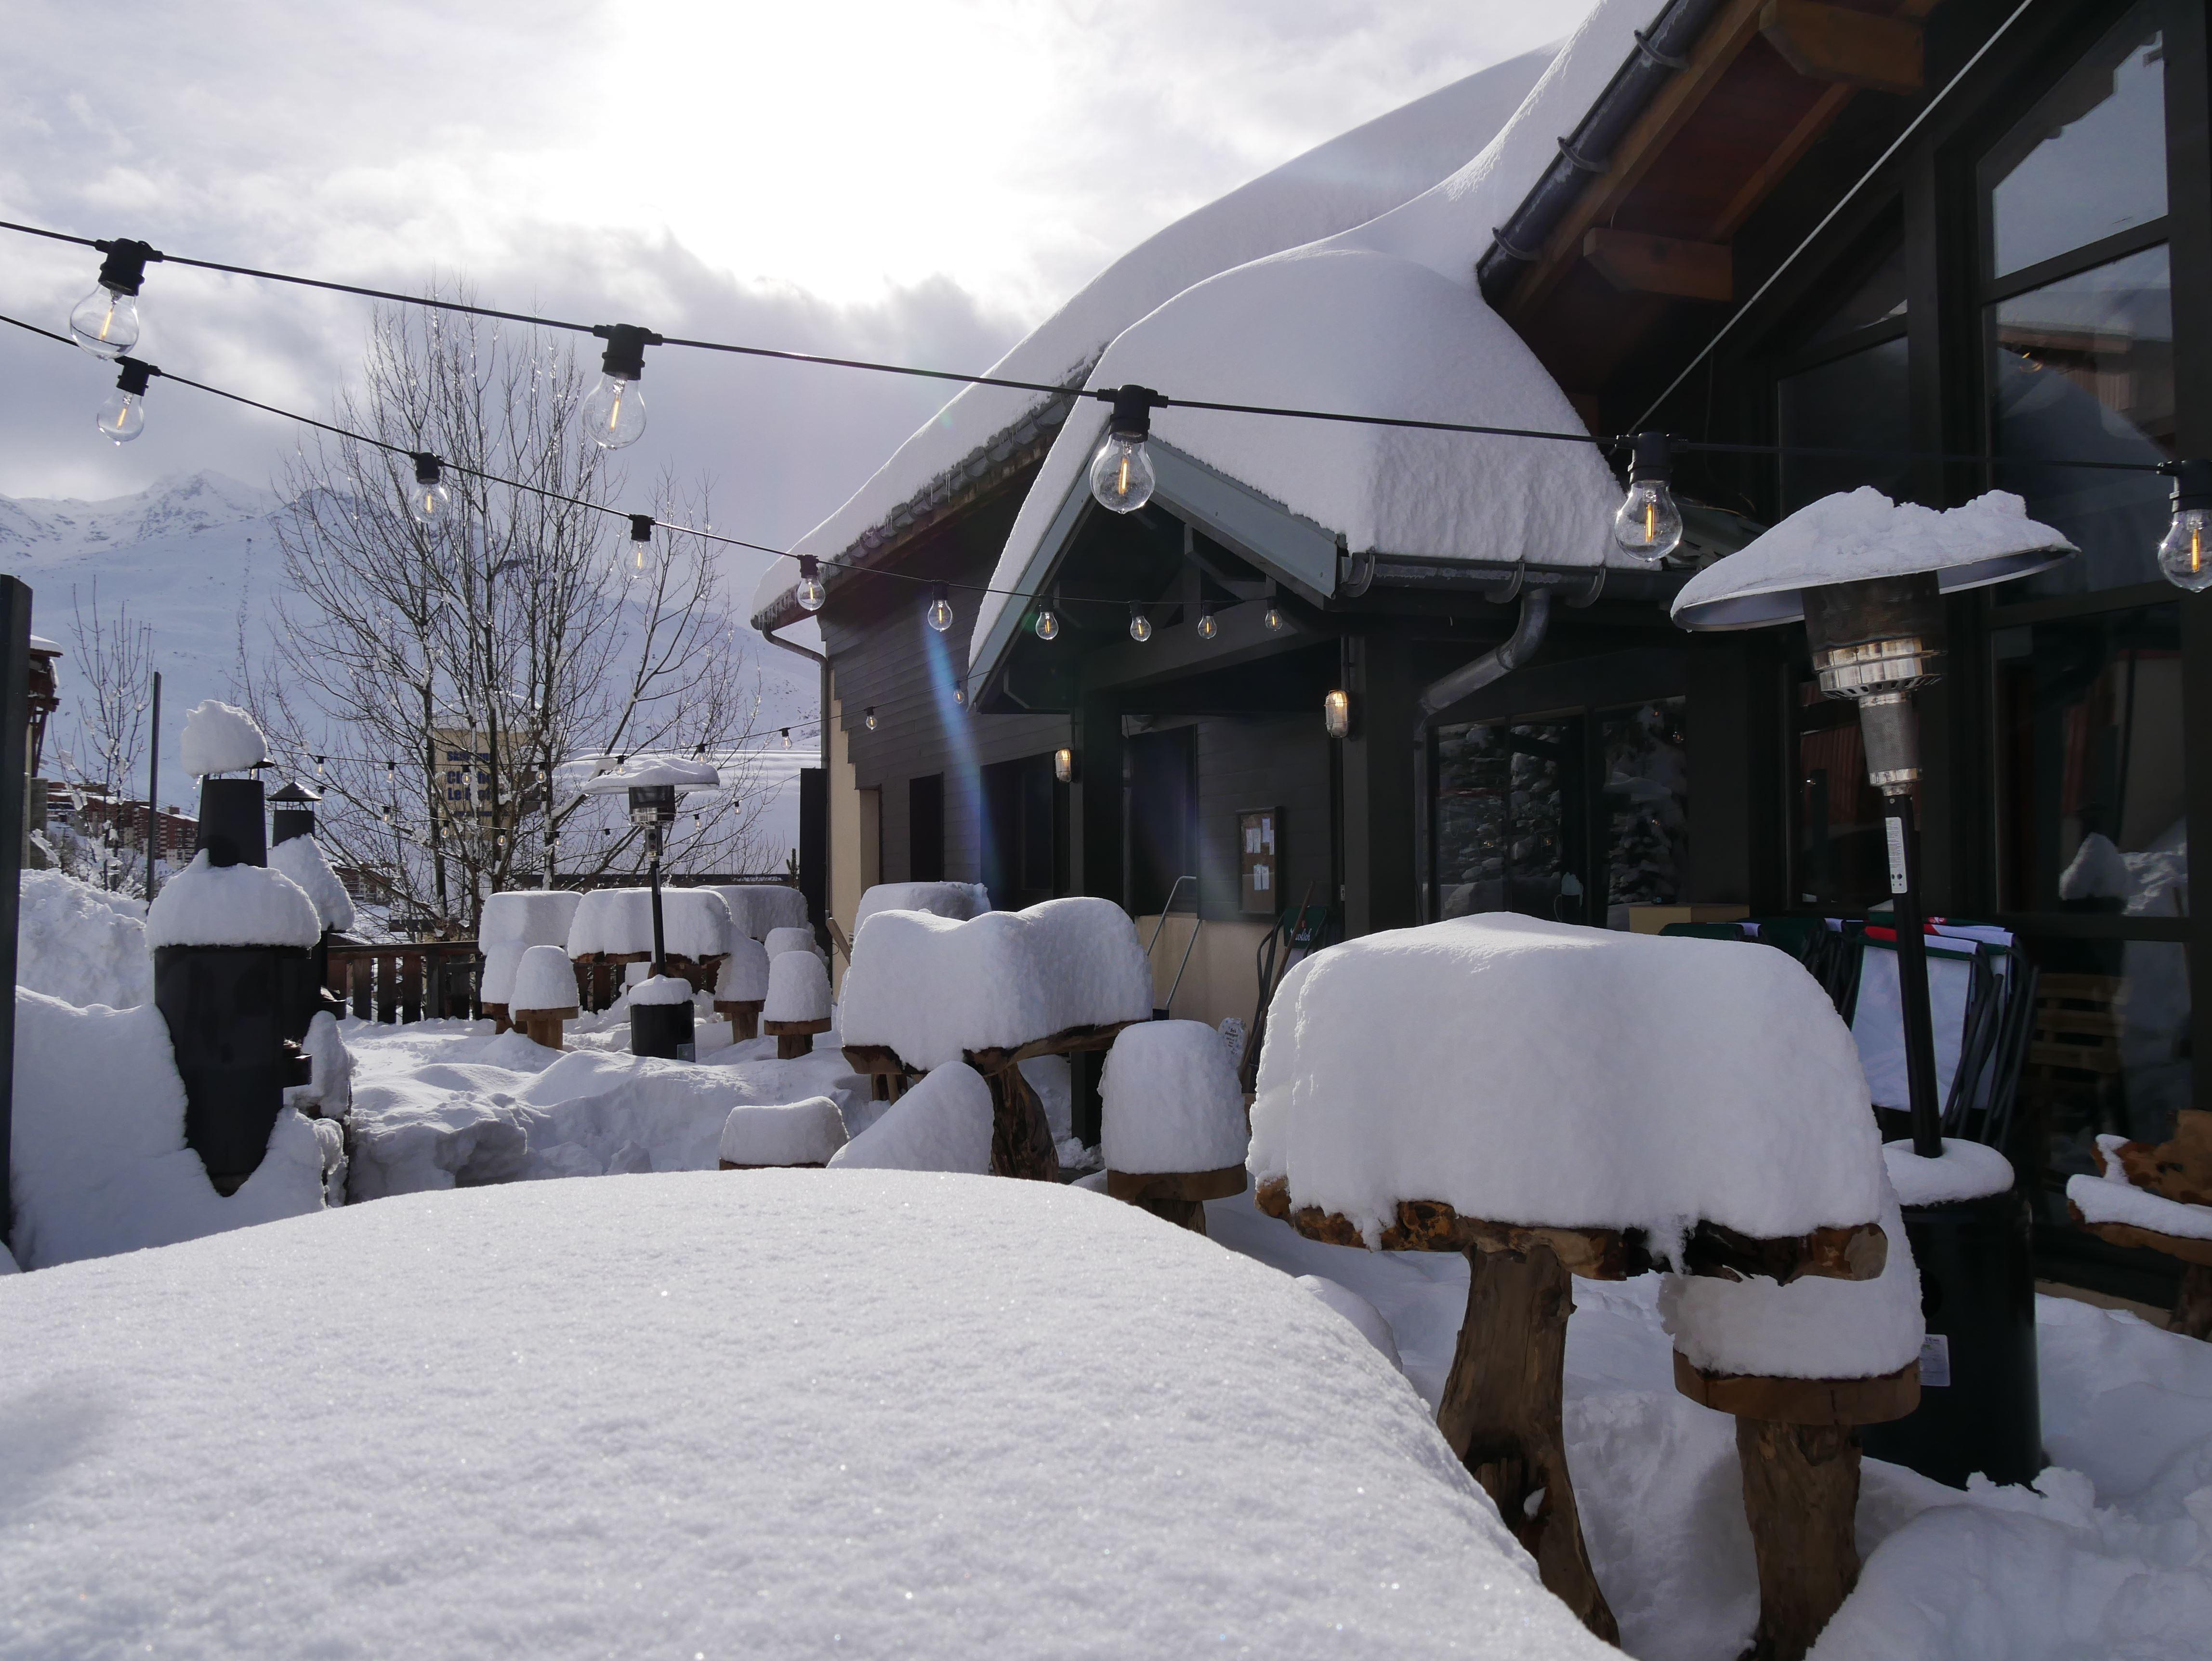 Ski-in ski-out hotel / HO36 LES MENUIRES